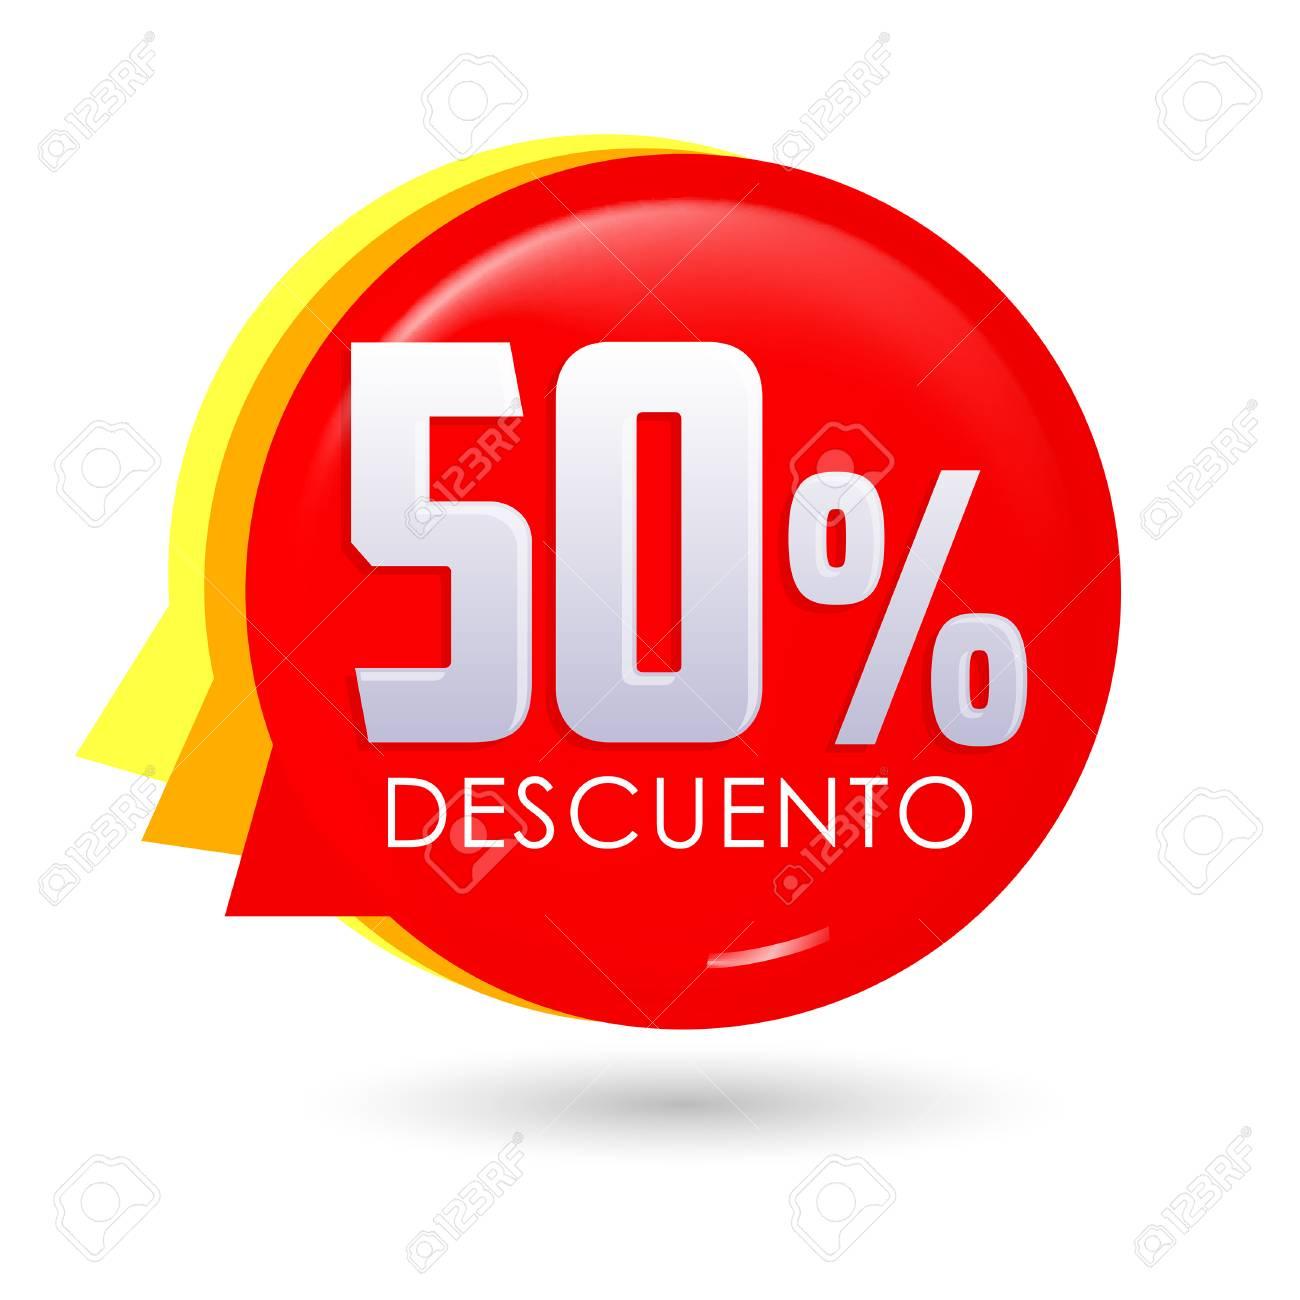 50% Descuento, 50% discount spanish text, bubble sale tag vector